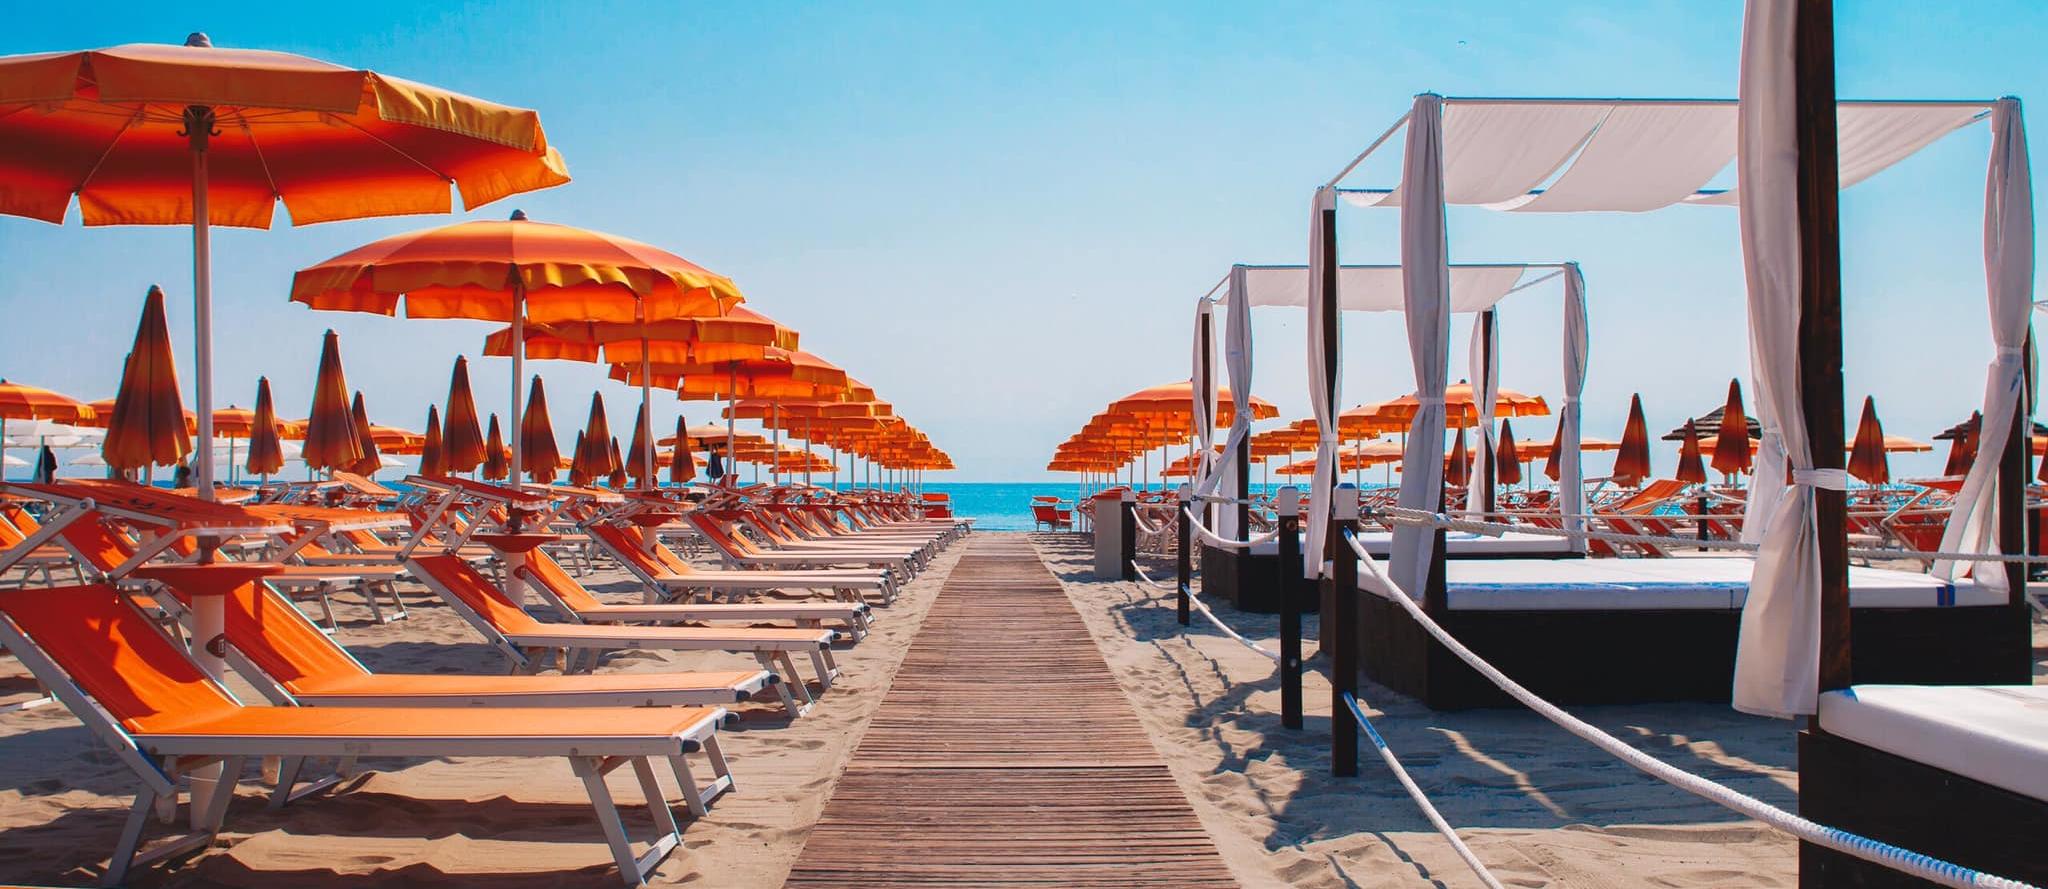 Papeete Beach - Milano Marittima